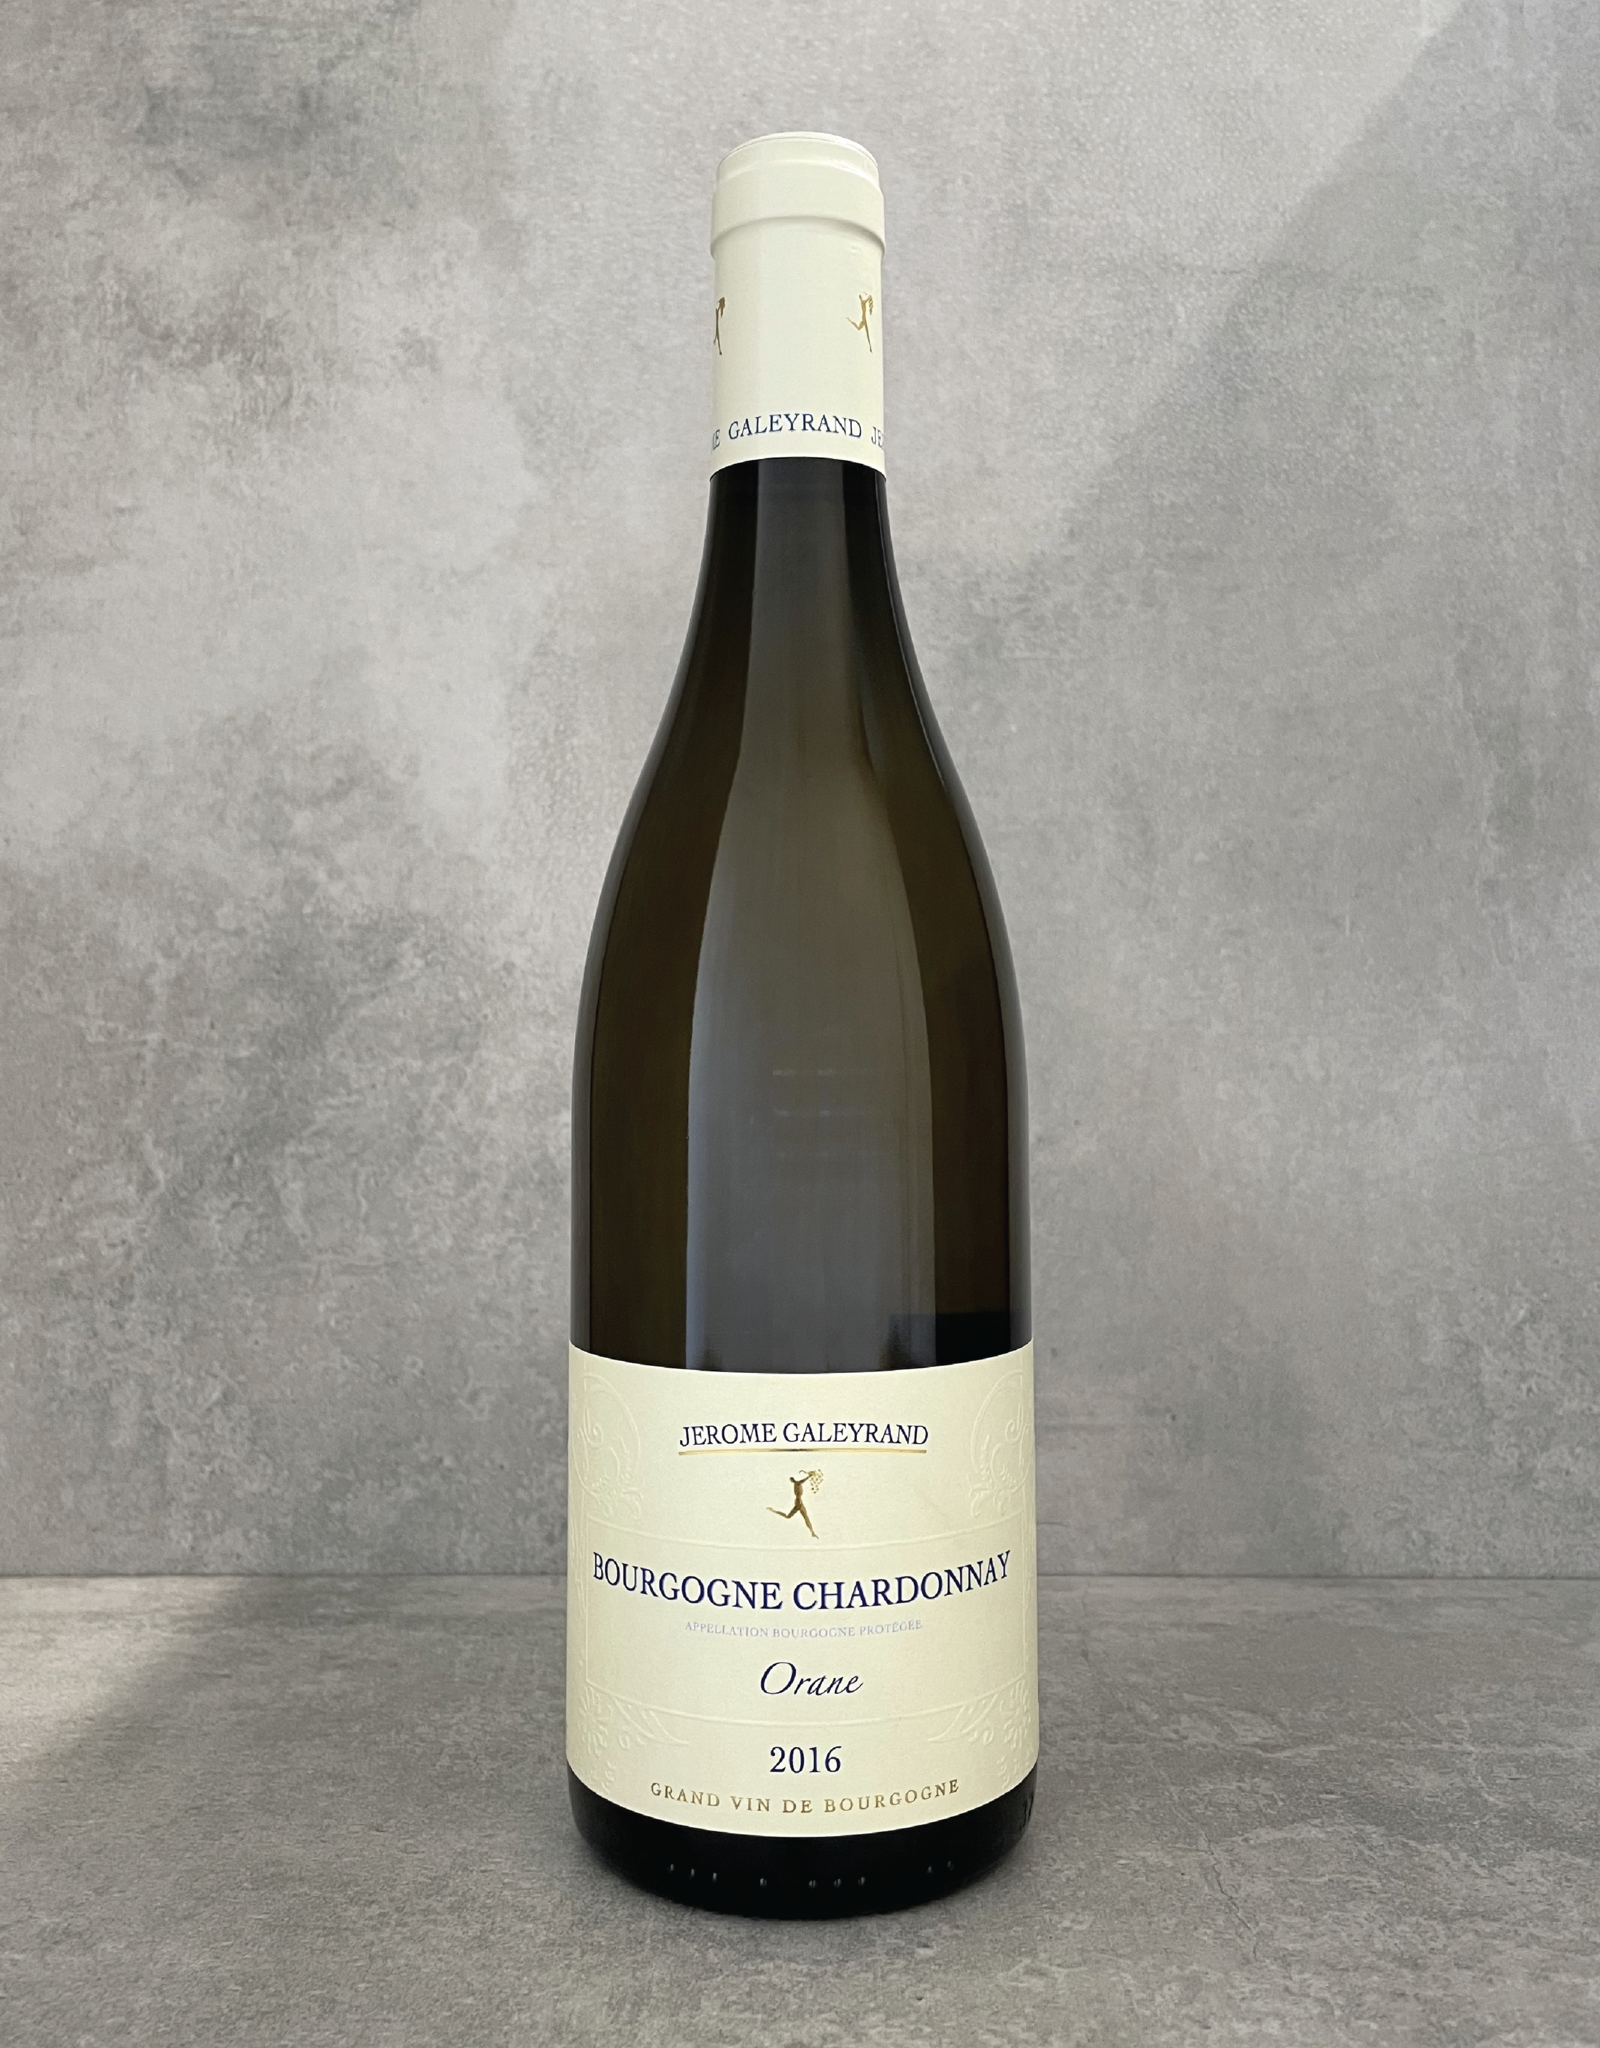 Jérôme Galeyrand Bourgogne Chardonnay 'Orane' 2016